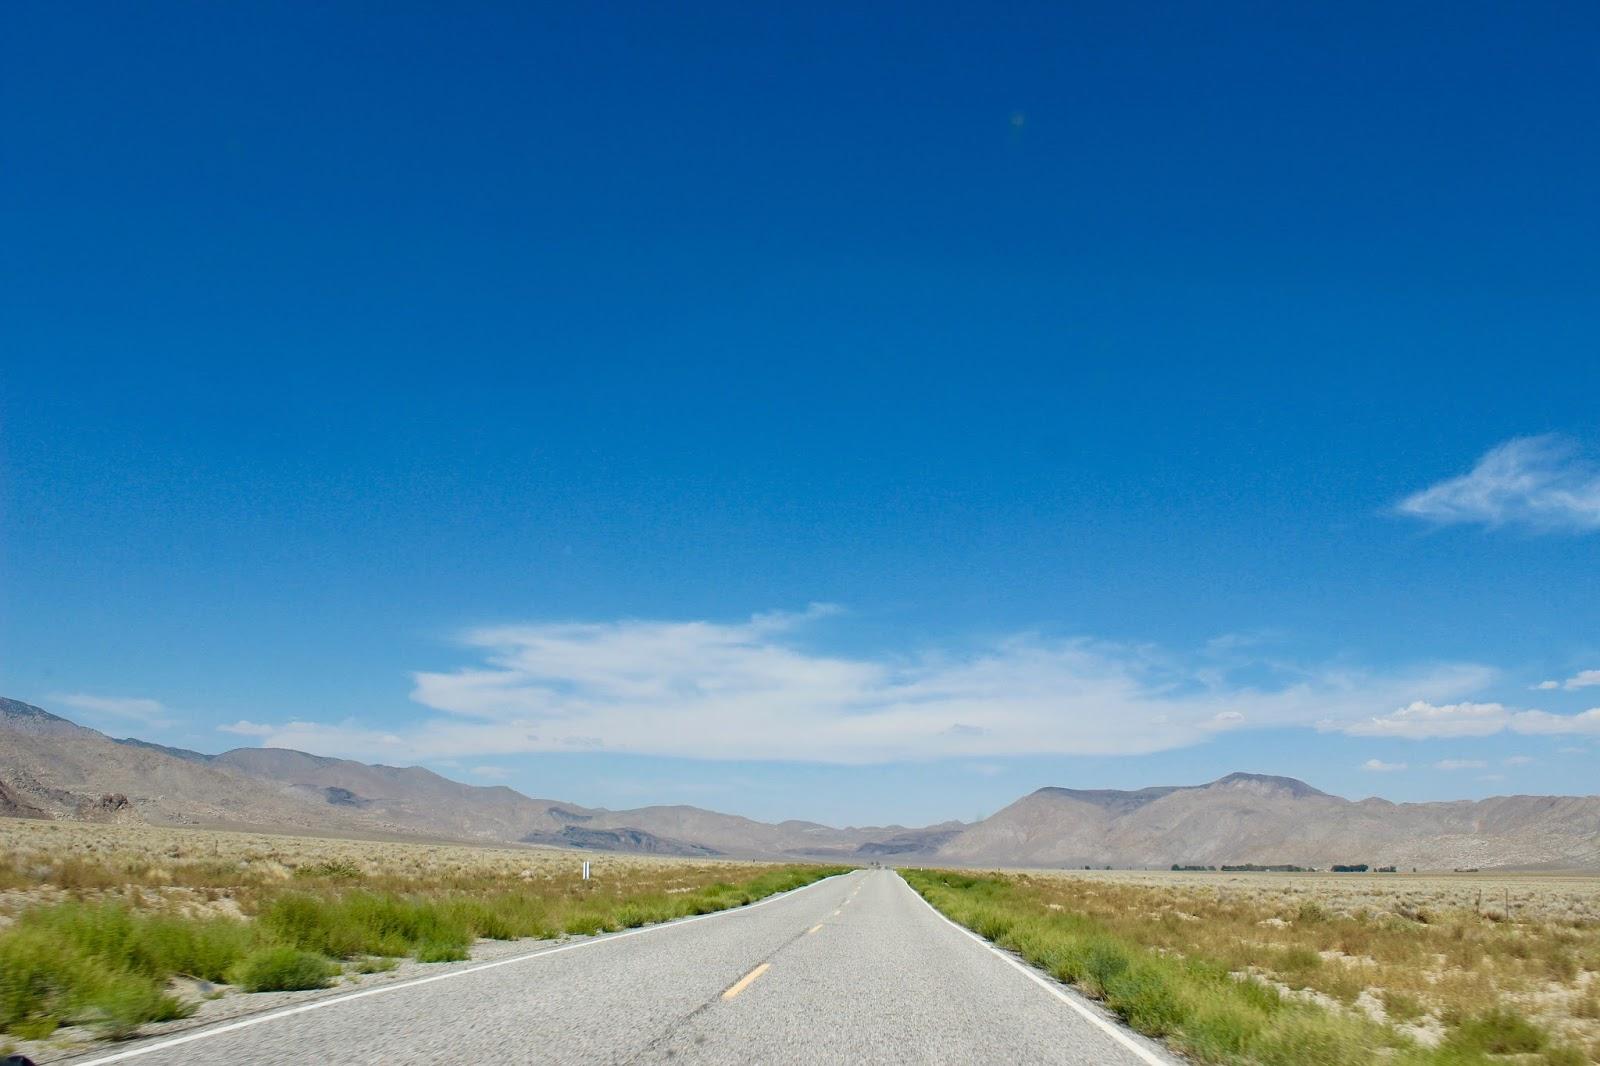 landscape on road trip through death valley California USA